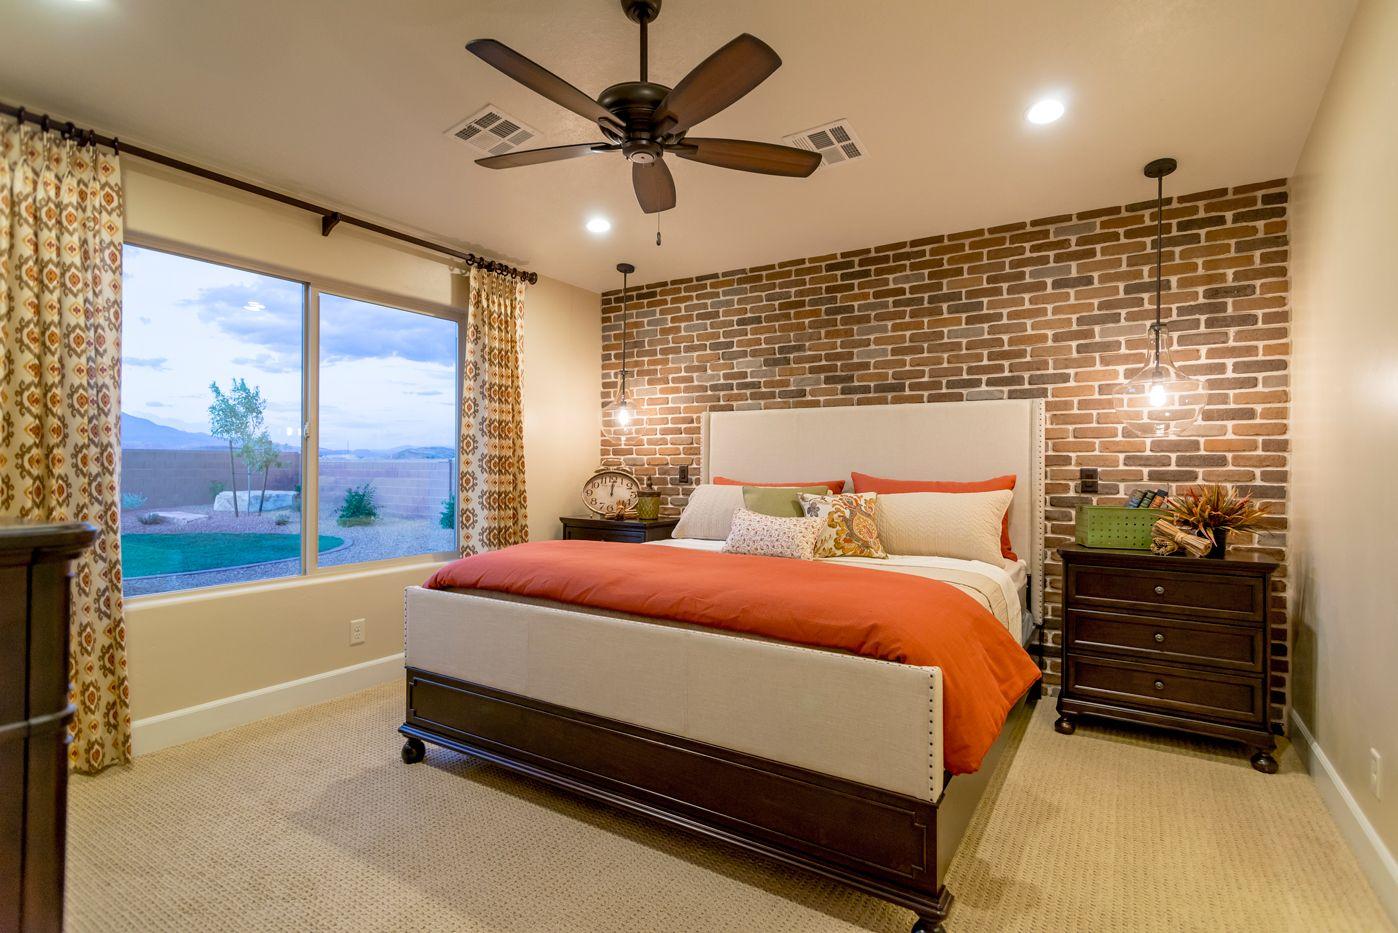 Bedroom featured in the Varano Vistas Plan 2015 By Ence Homes in St. George, UT